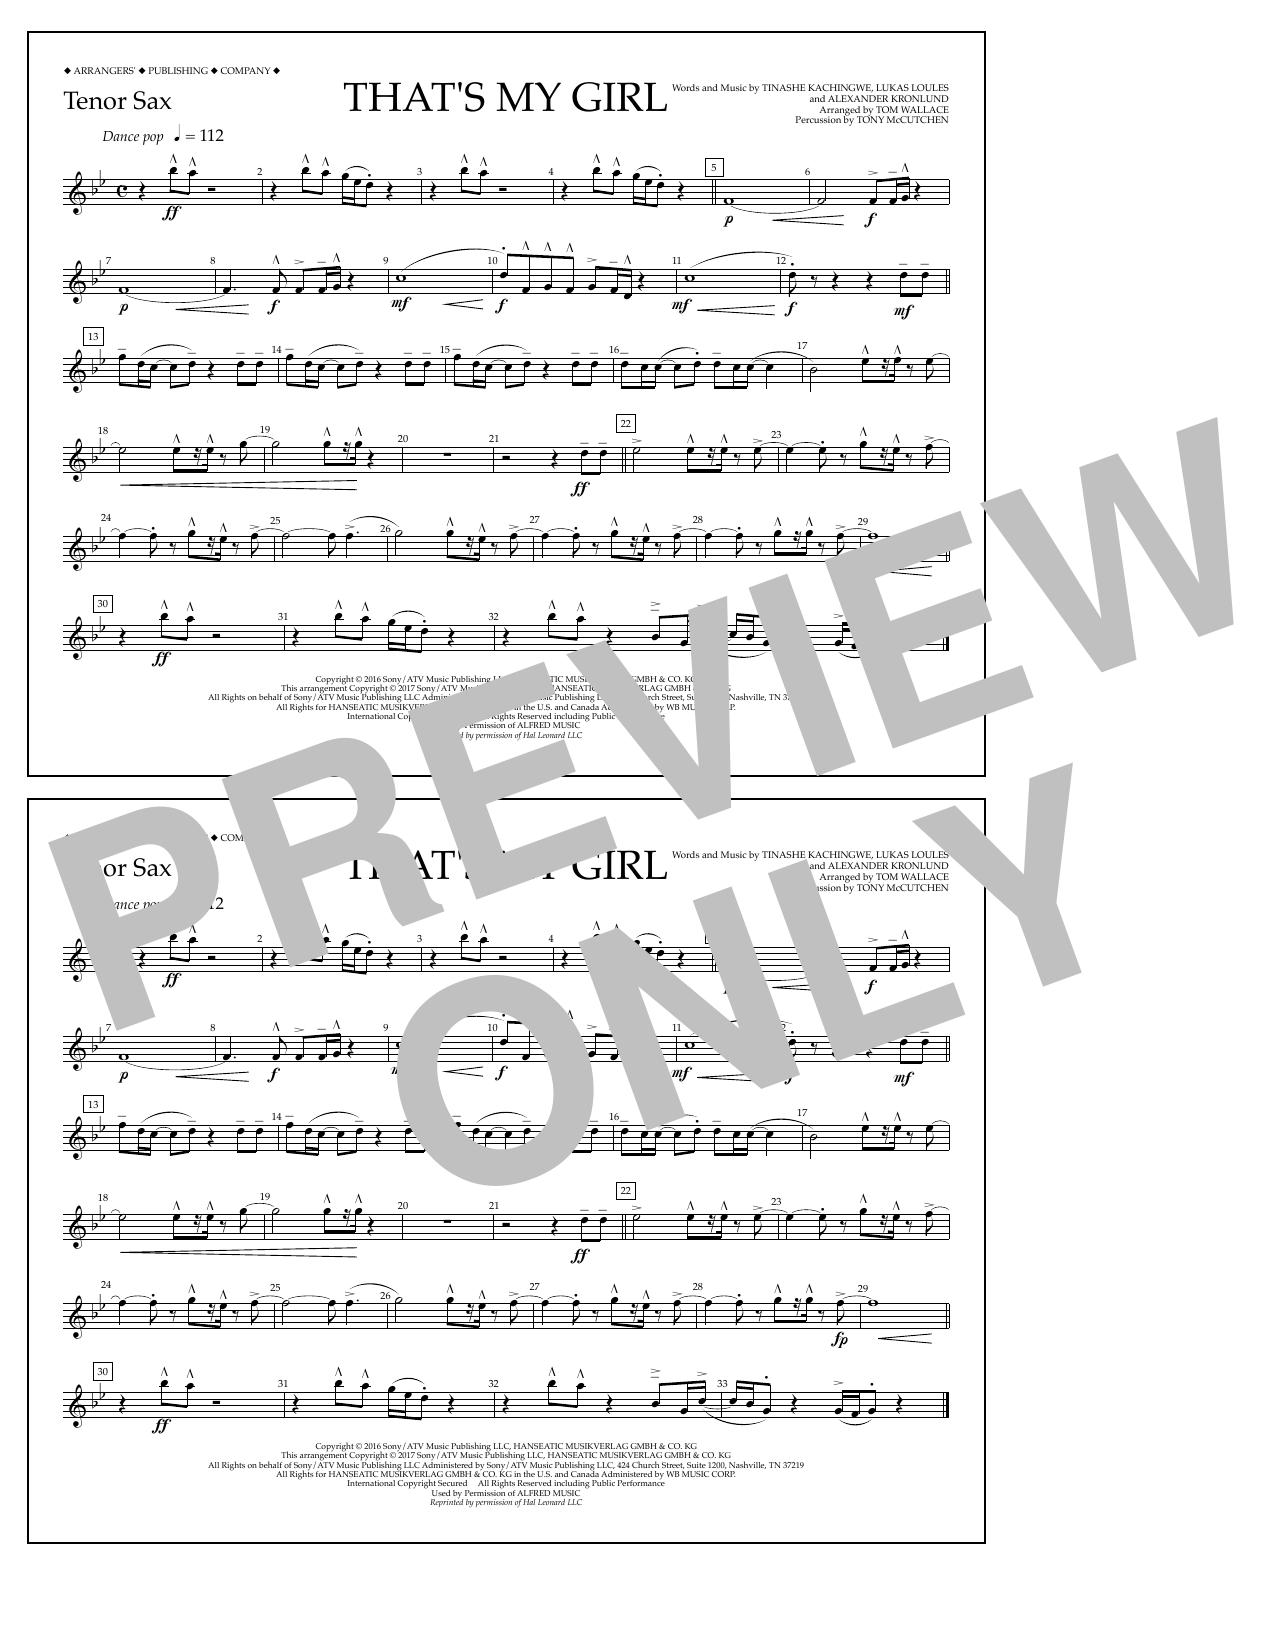 That's My Girl - Tenor Sax Sheet Music